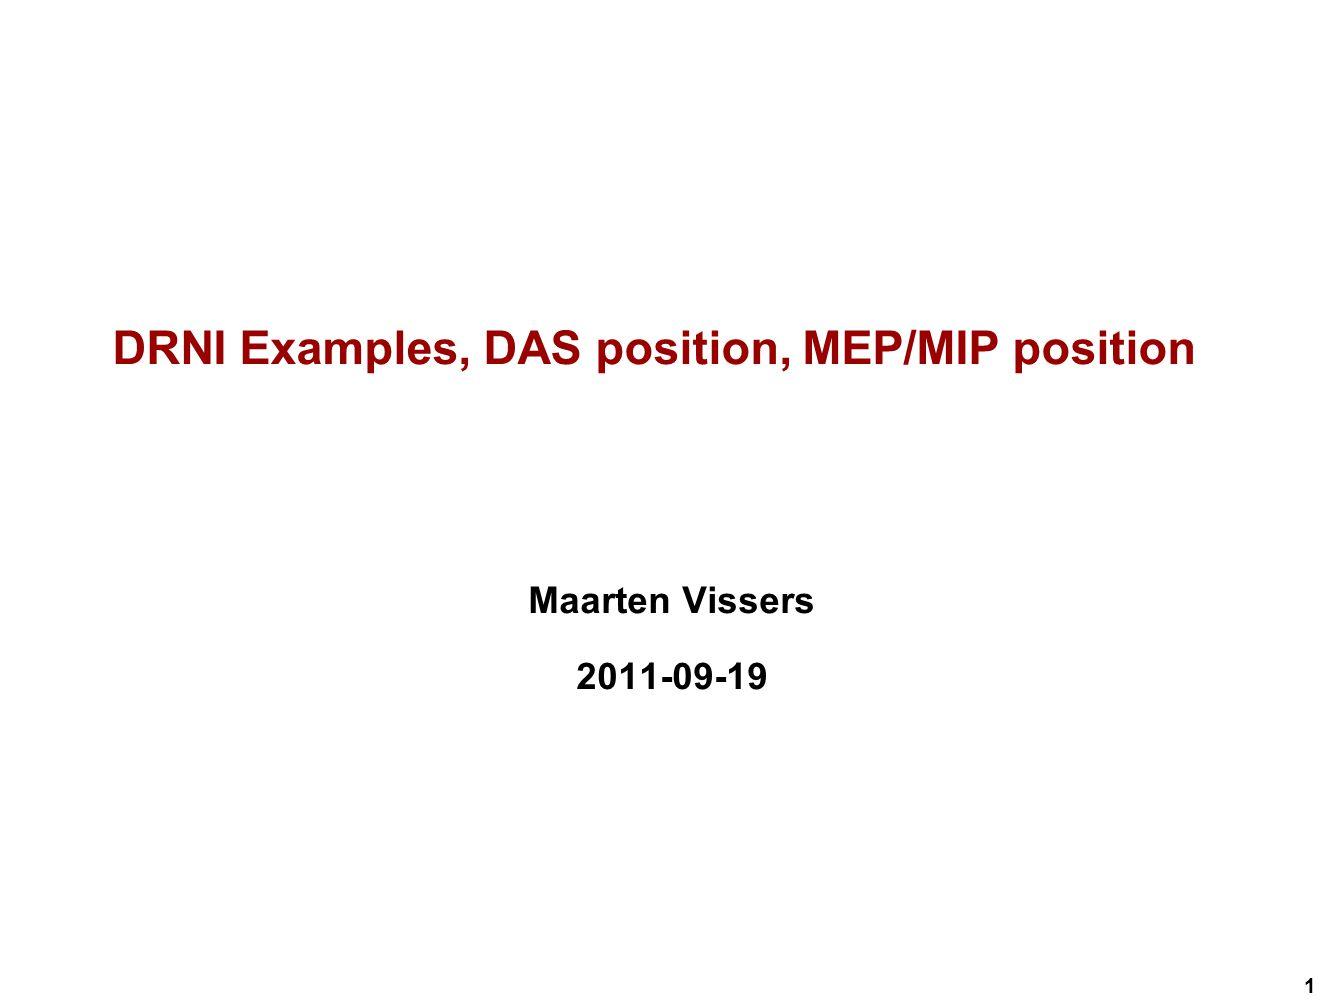 1 DRNI Examples, DAS position, MEP/MIP position Maarten Vissers 2011-09-19